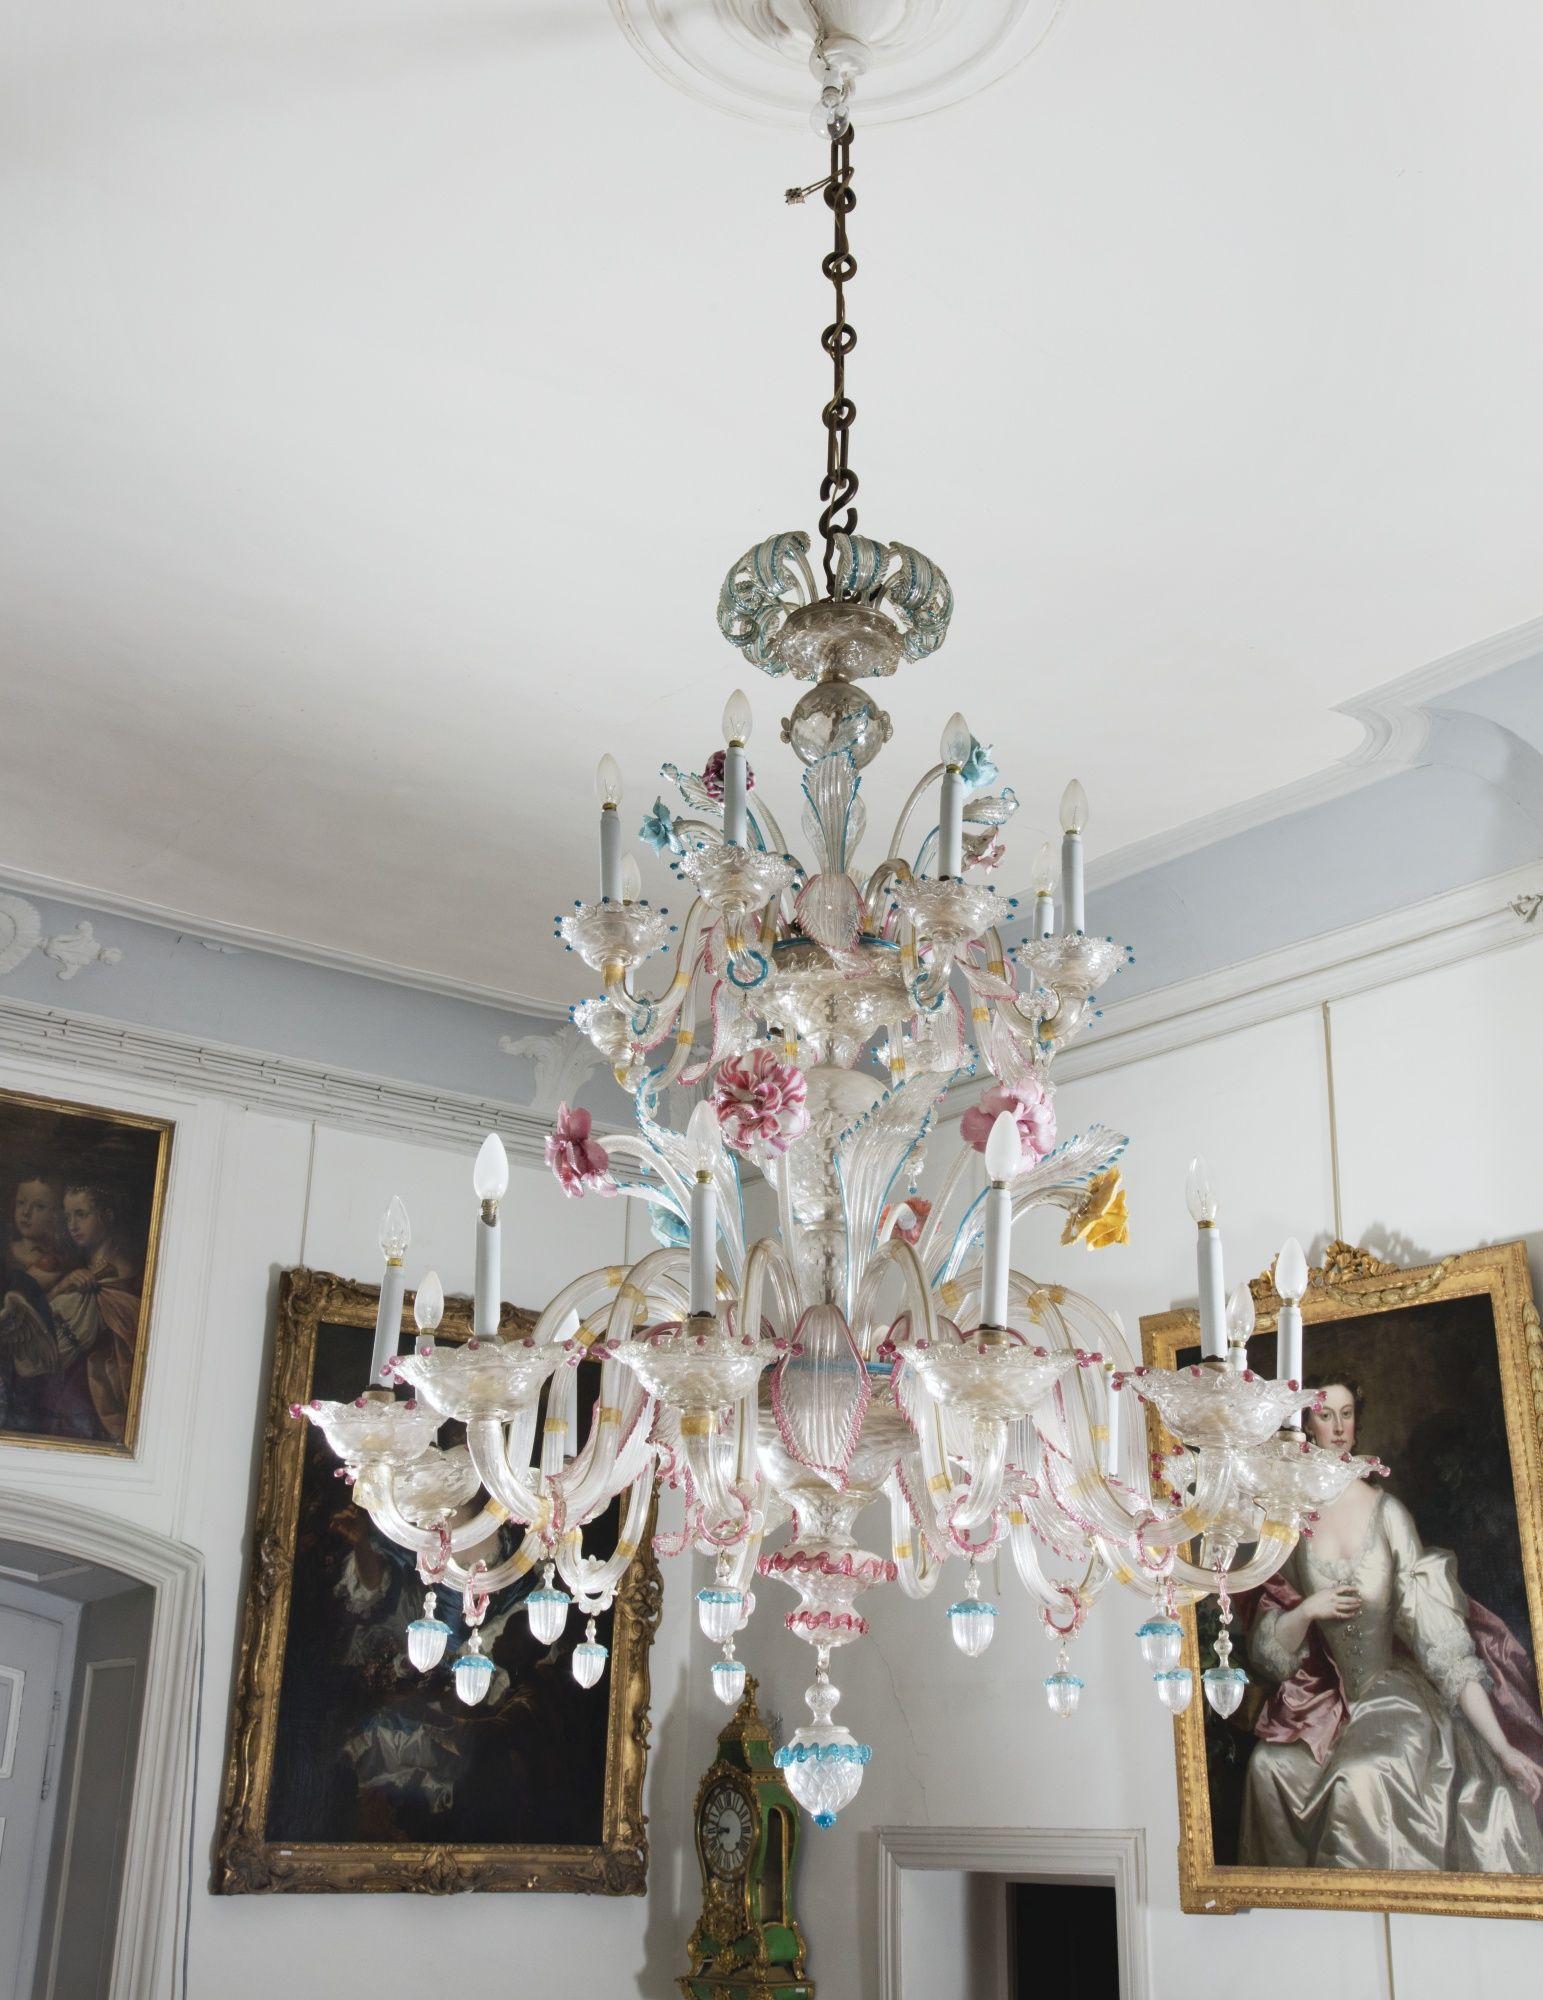 baccarat harmonie bud vase of a venetian twenty lights murano glass chandelier late 19th century with regard to a venetian twenty lights murano glass chandelier late 19th century